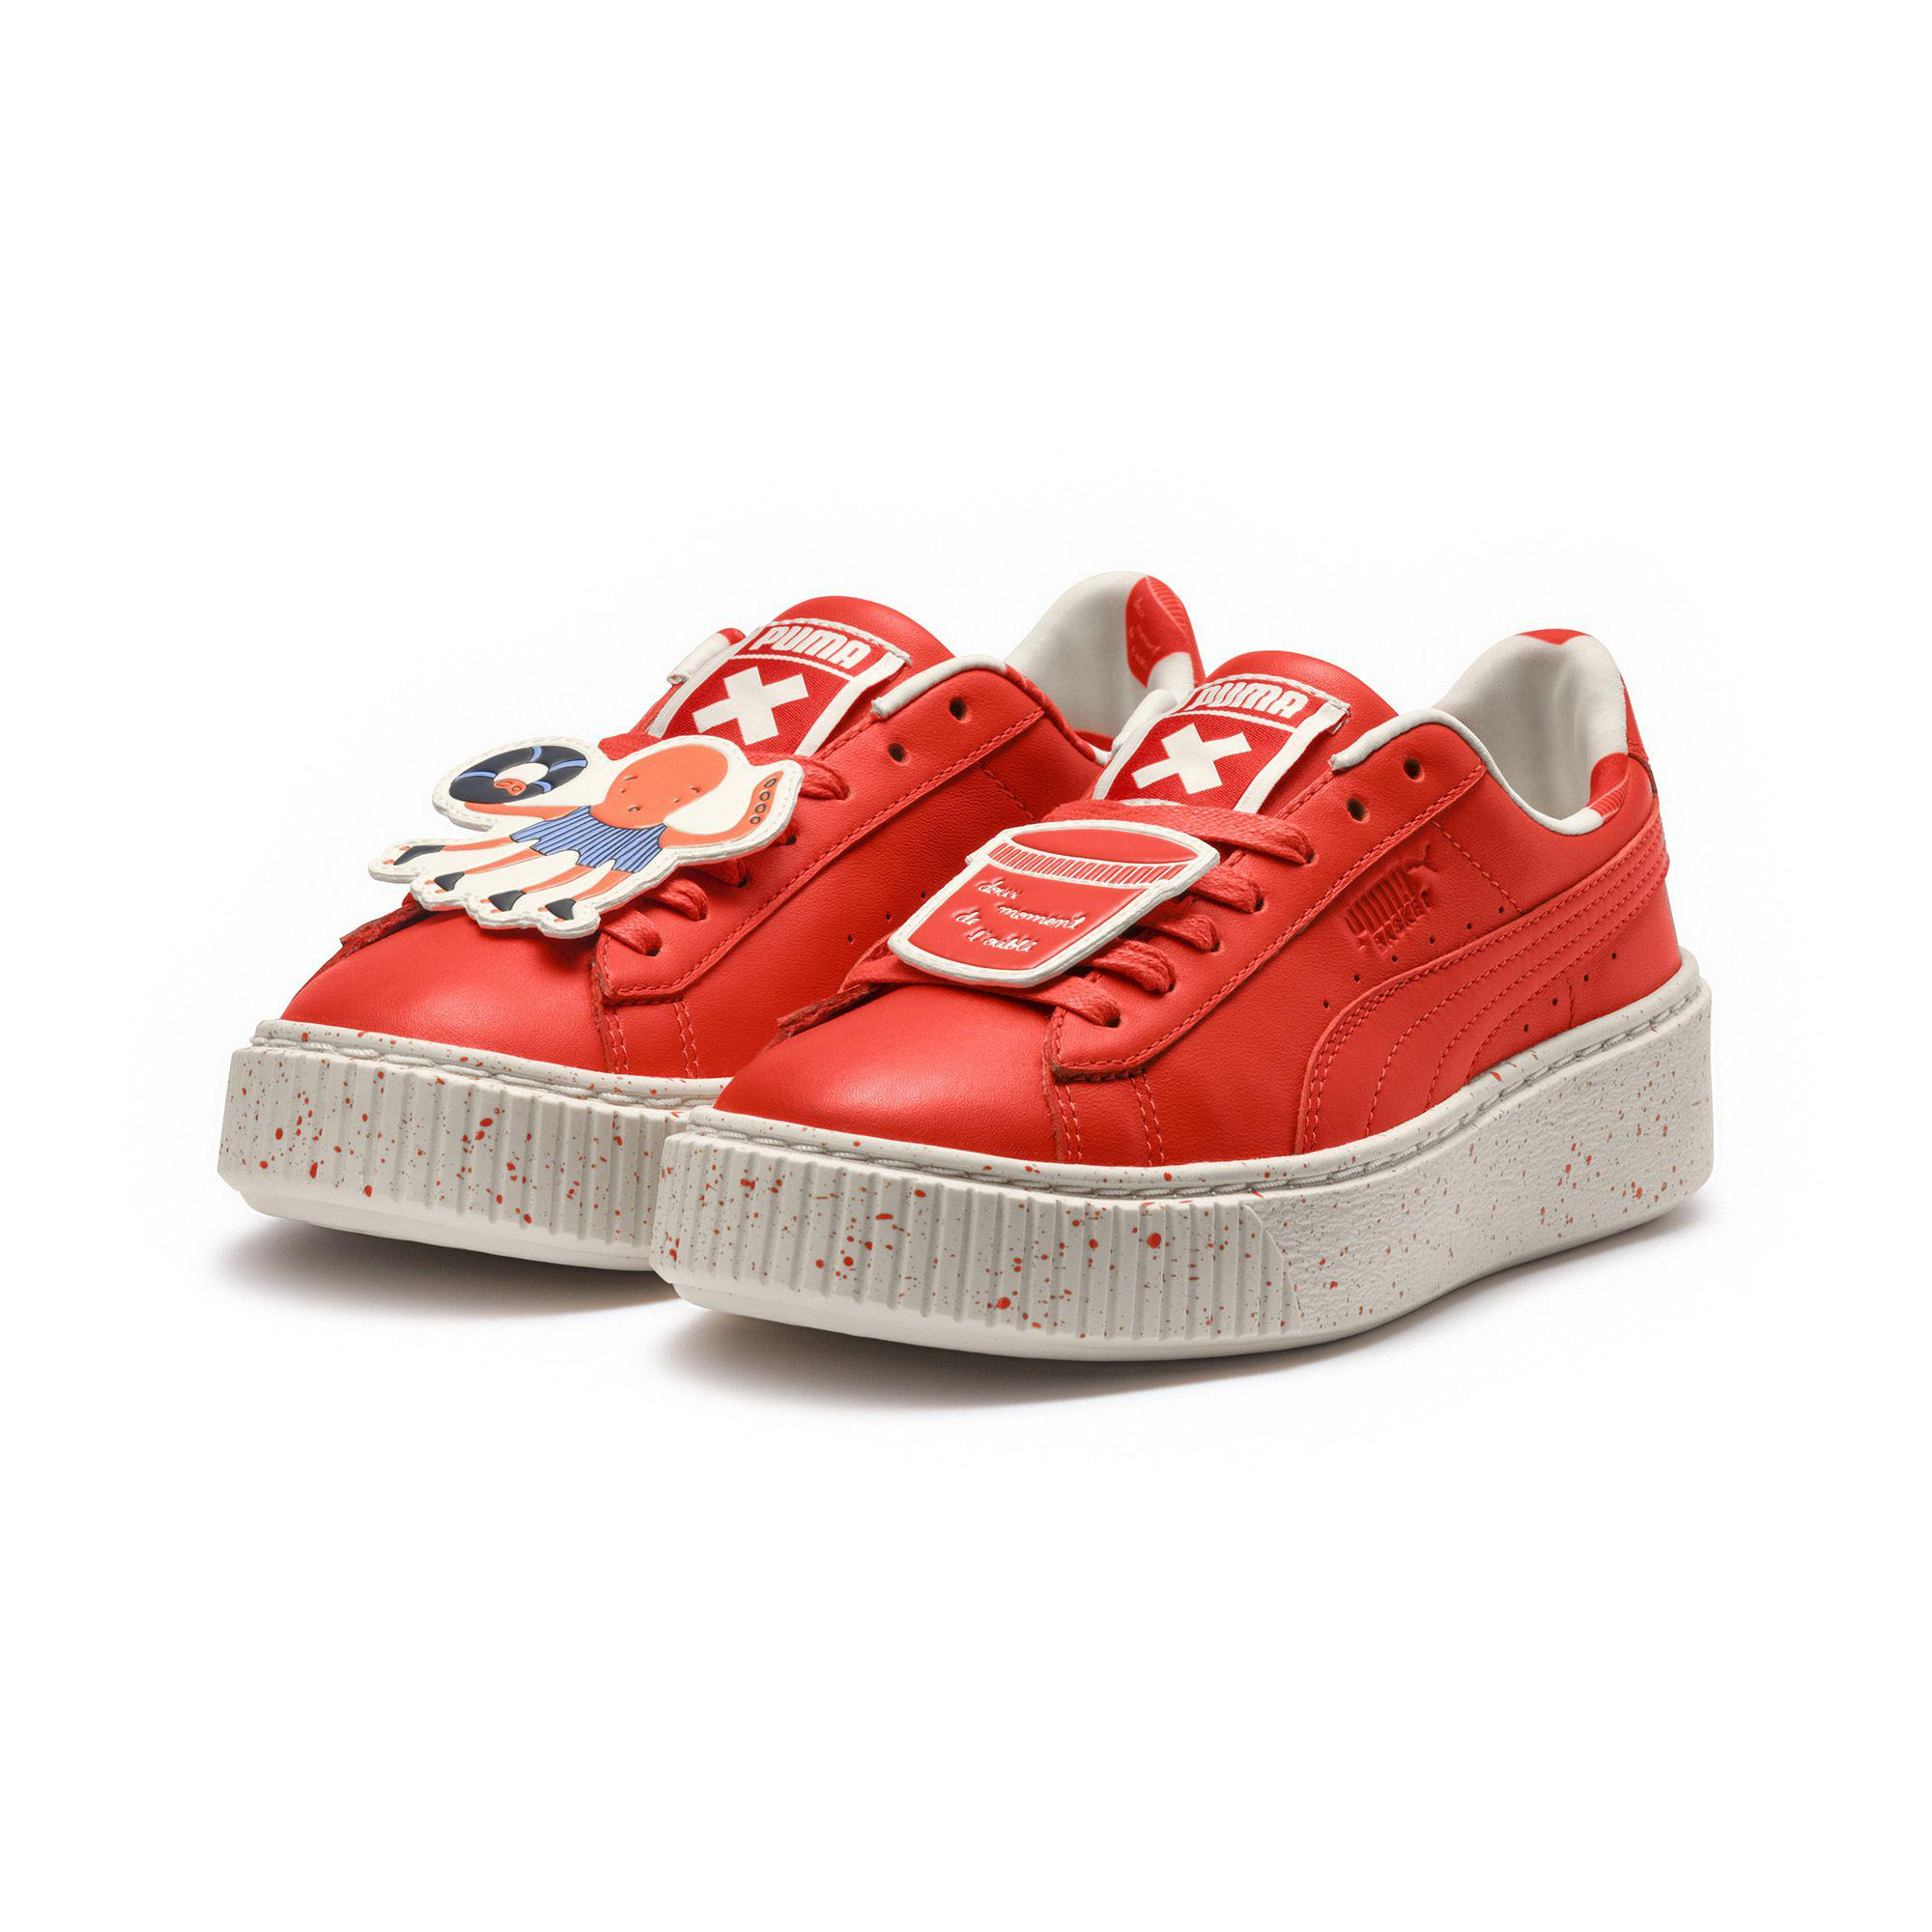 size 40 2d238 3caad Gallery. Women s Platform Sneakers